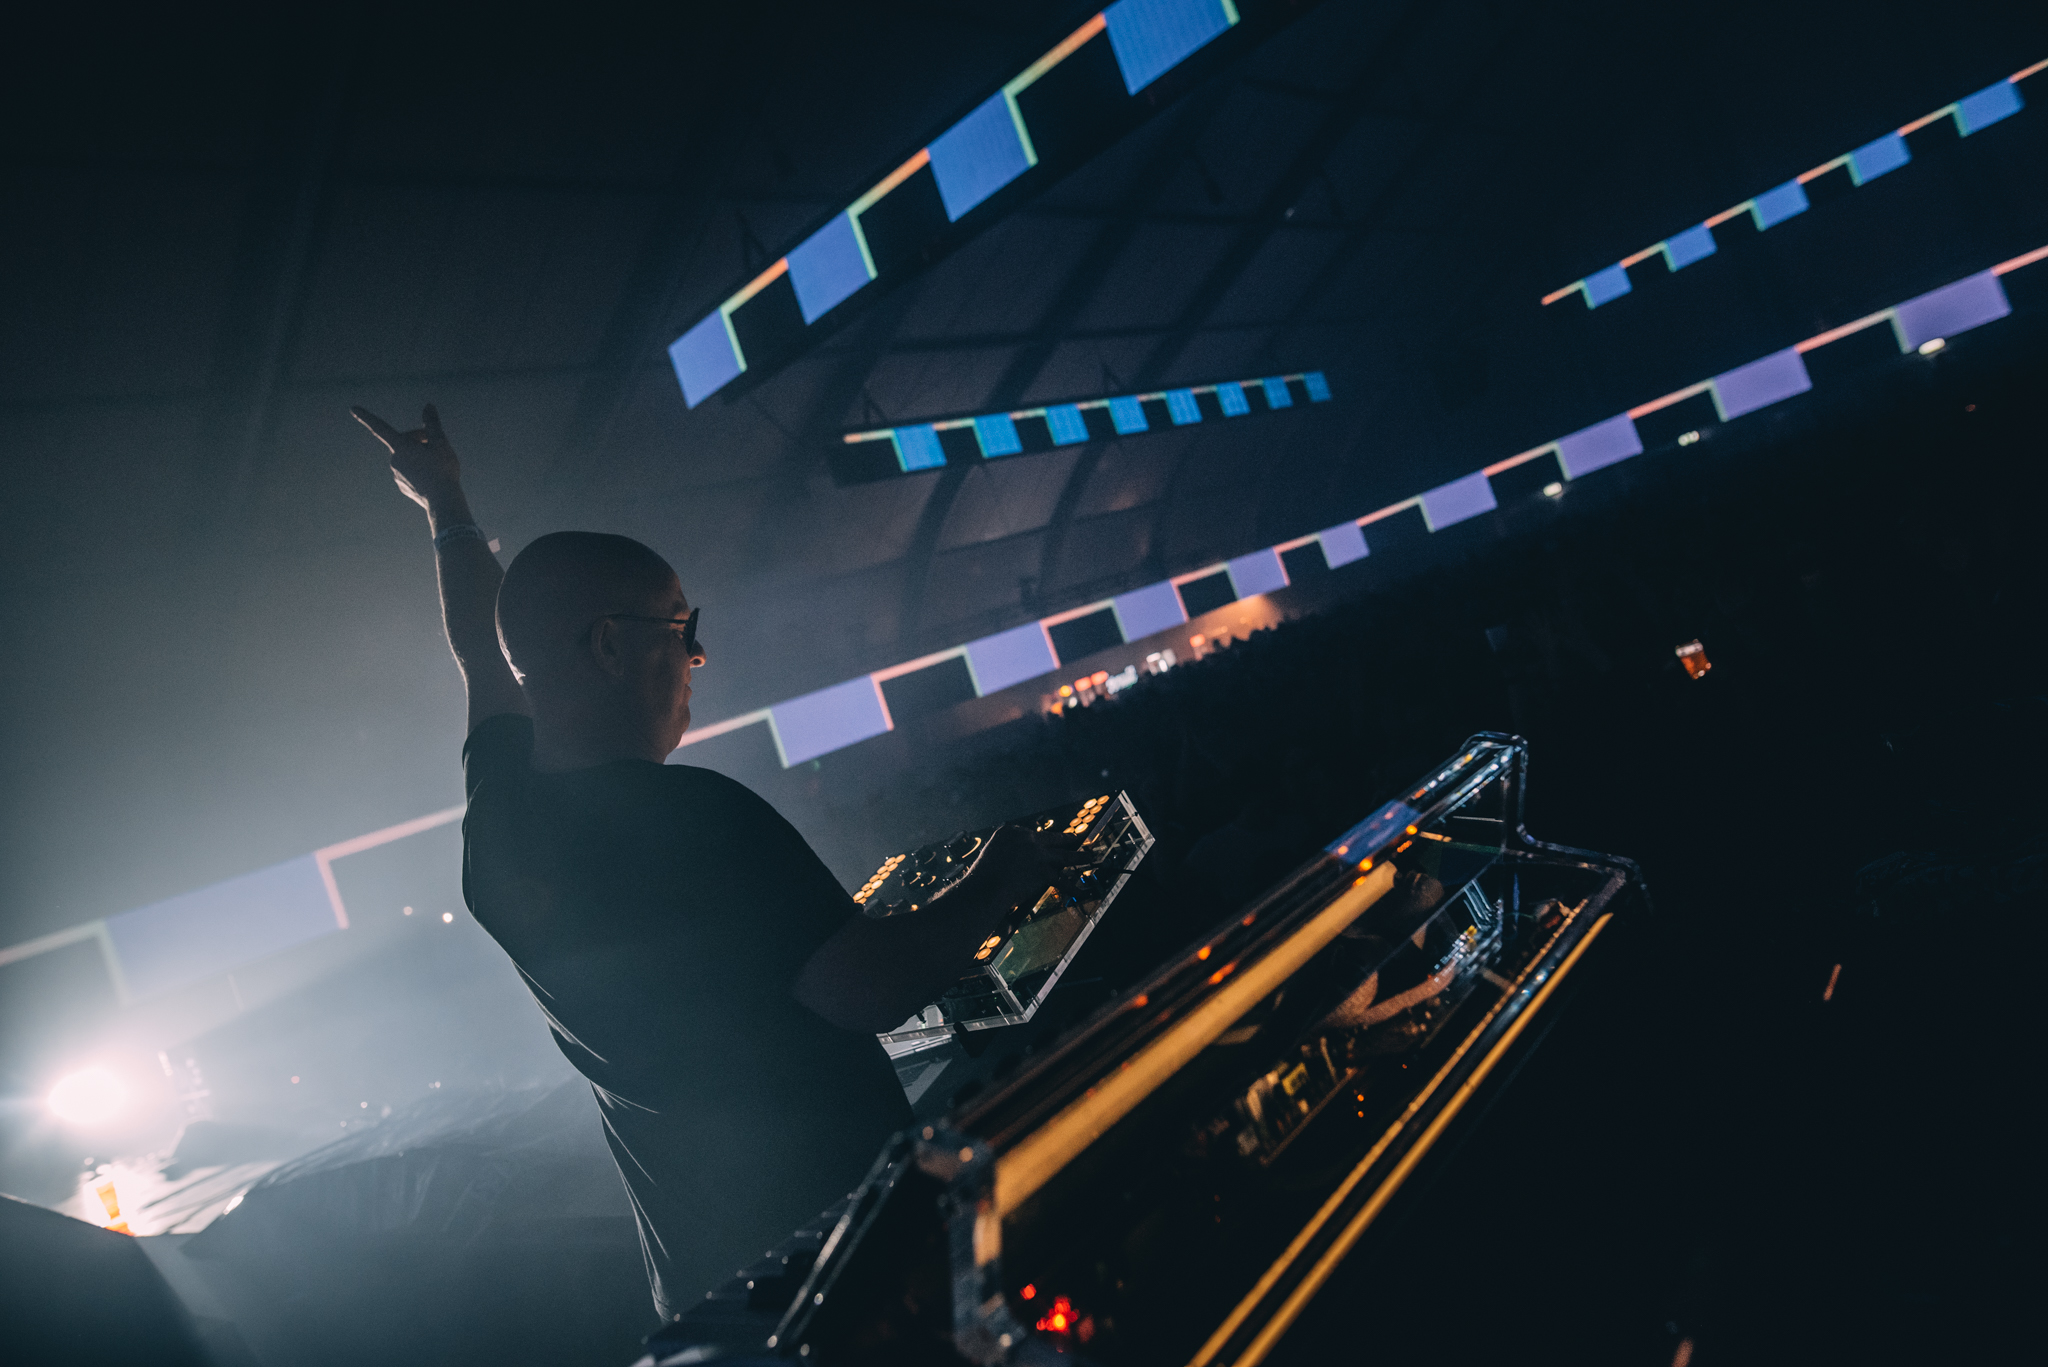 DGTL Amsterdam '18 - Electronic Groove